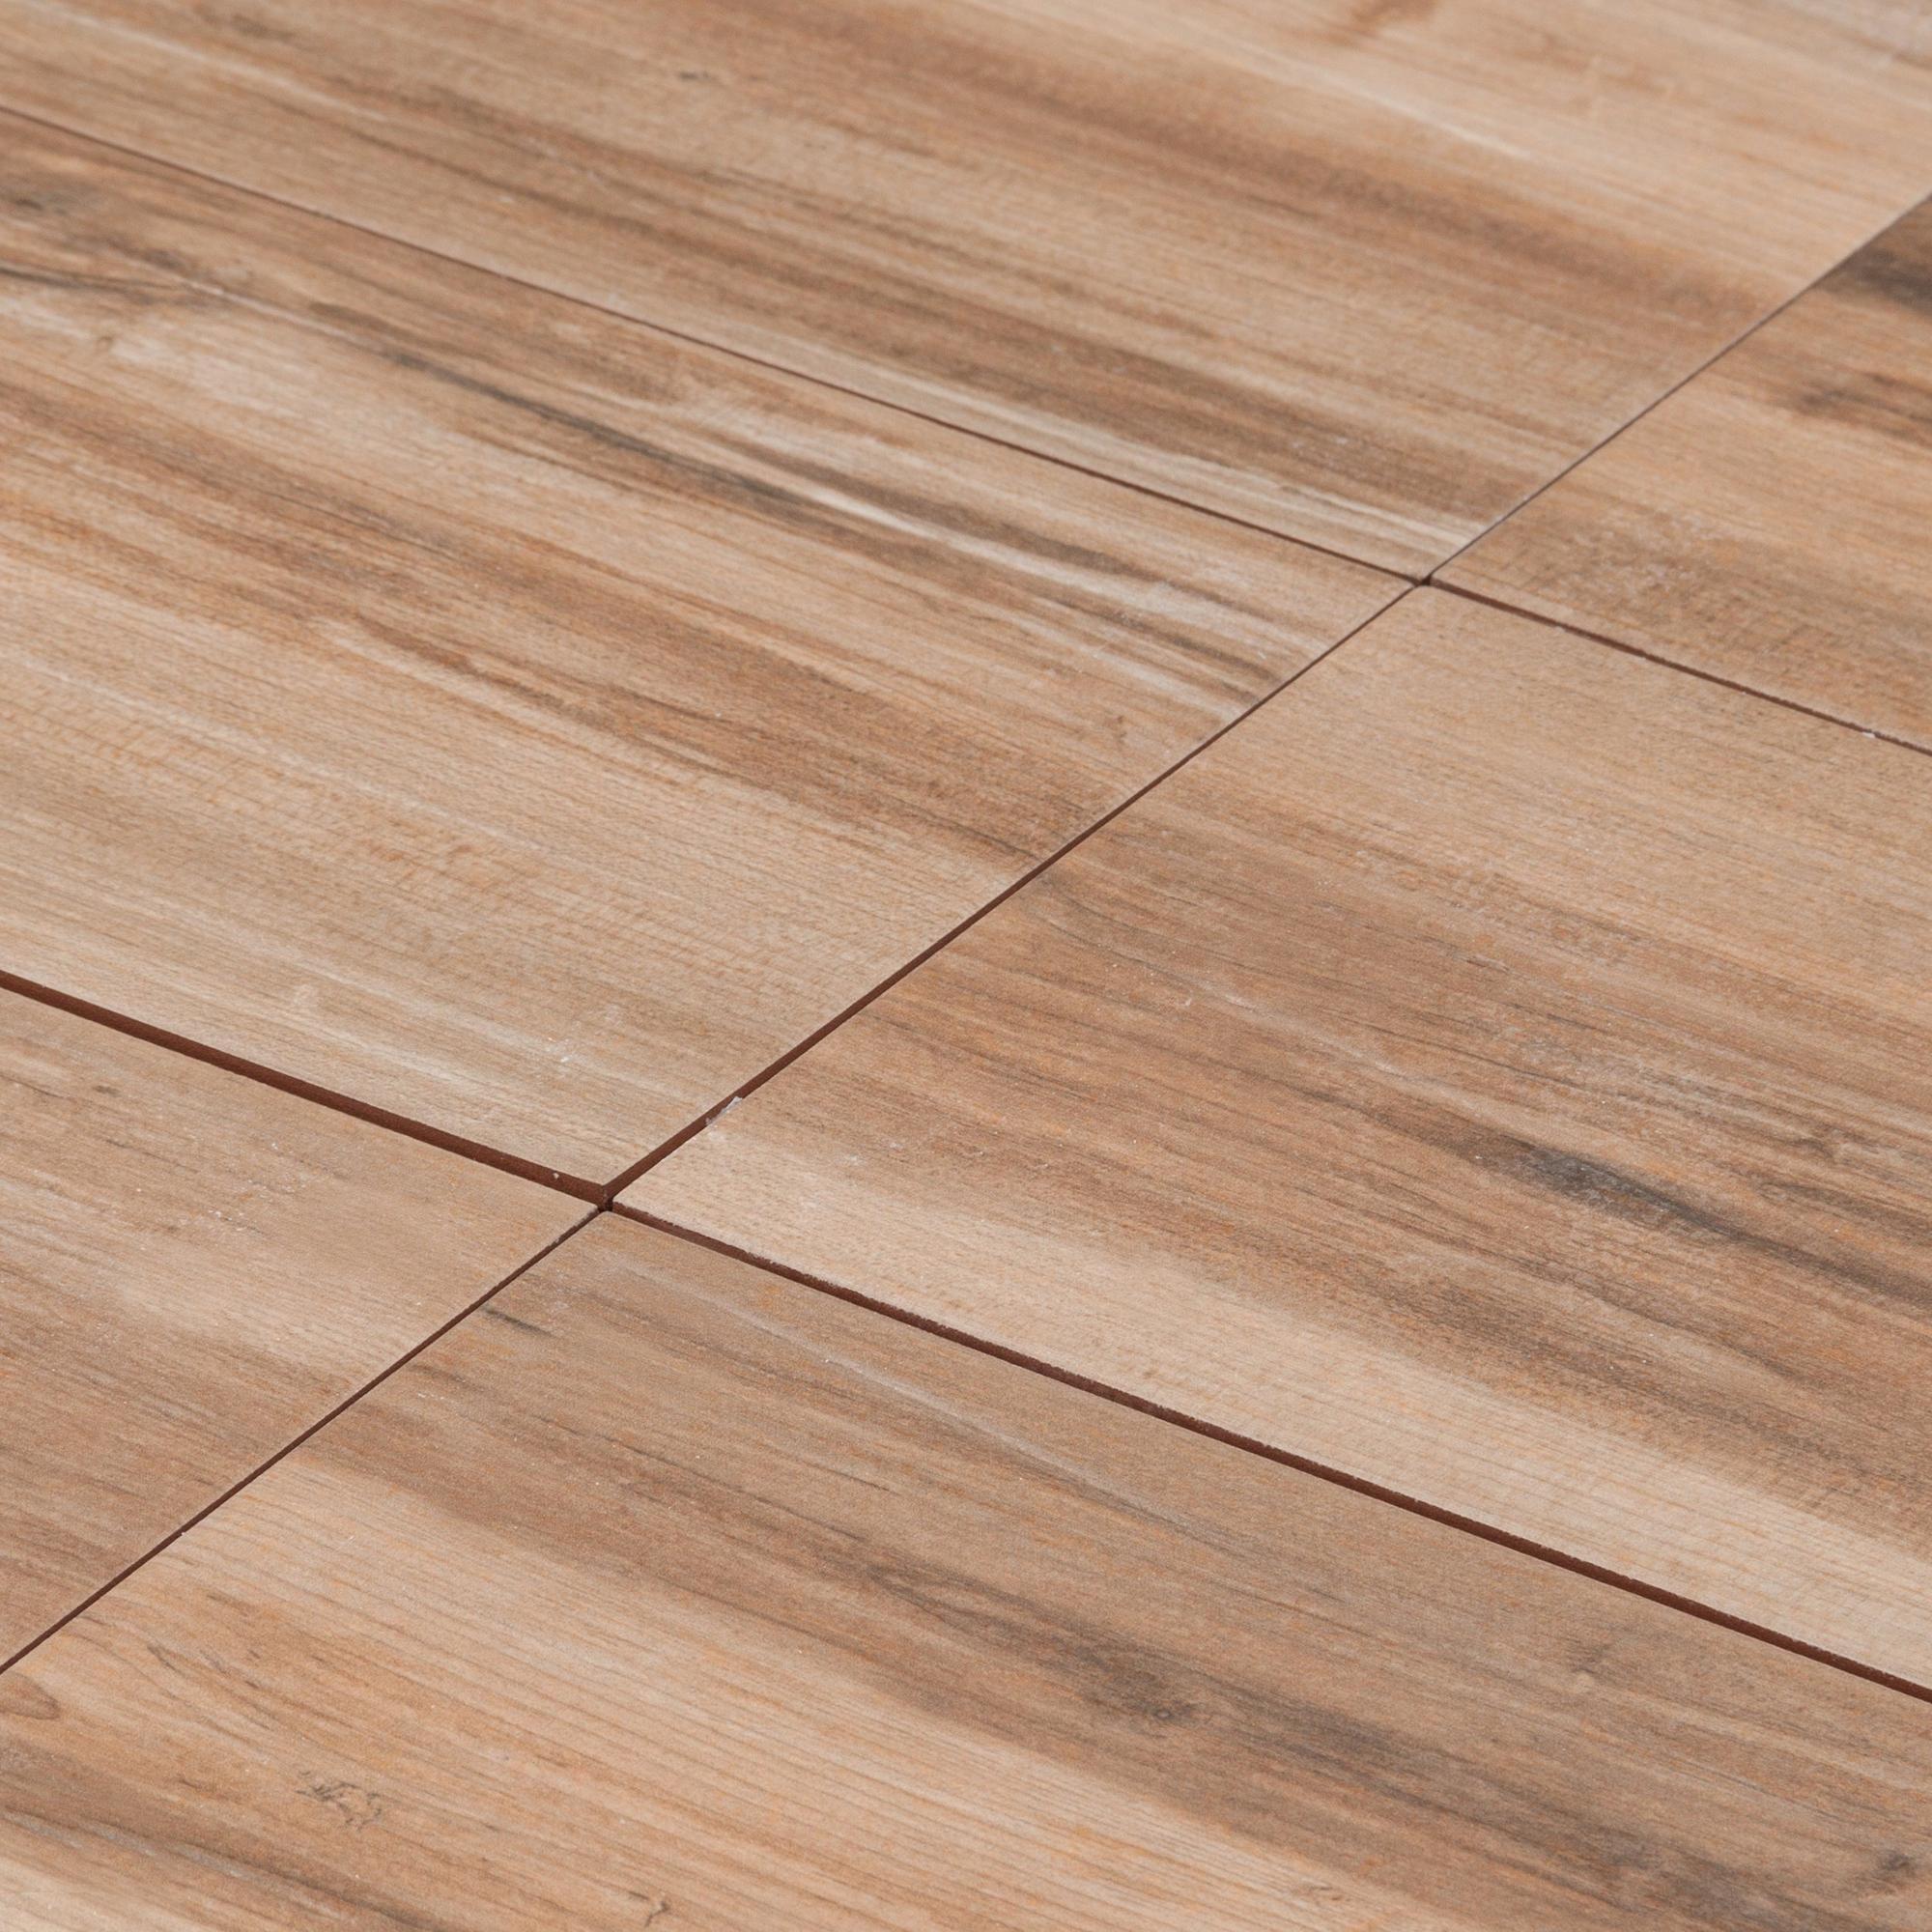 Saman Roble Wood Plank Ceramic Tile Wood Planks Ceramic Tiles Wood Look Tile